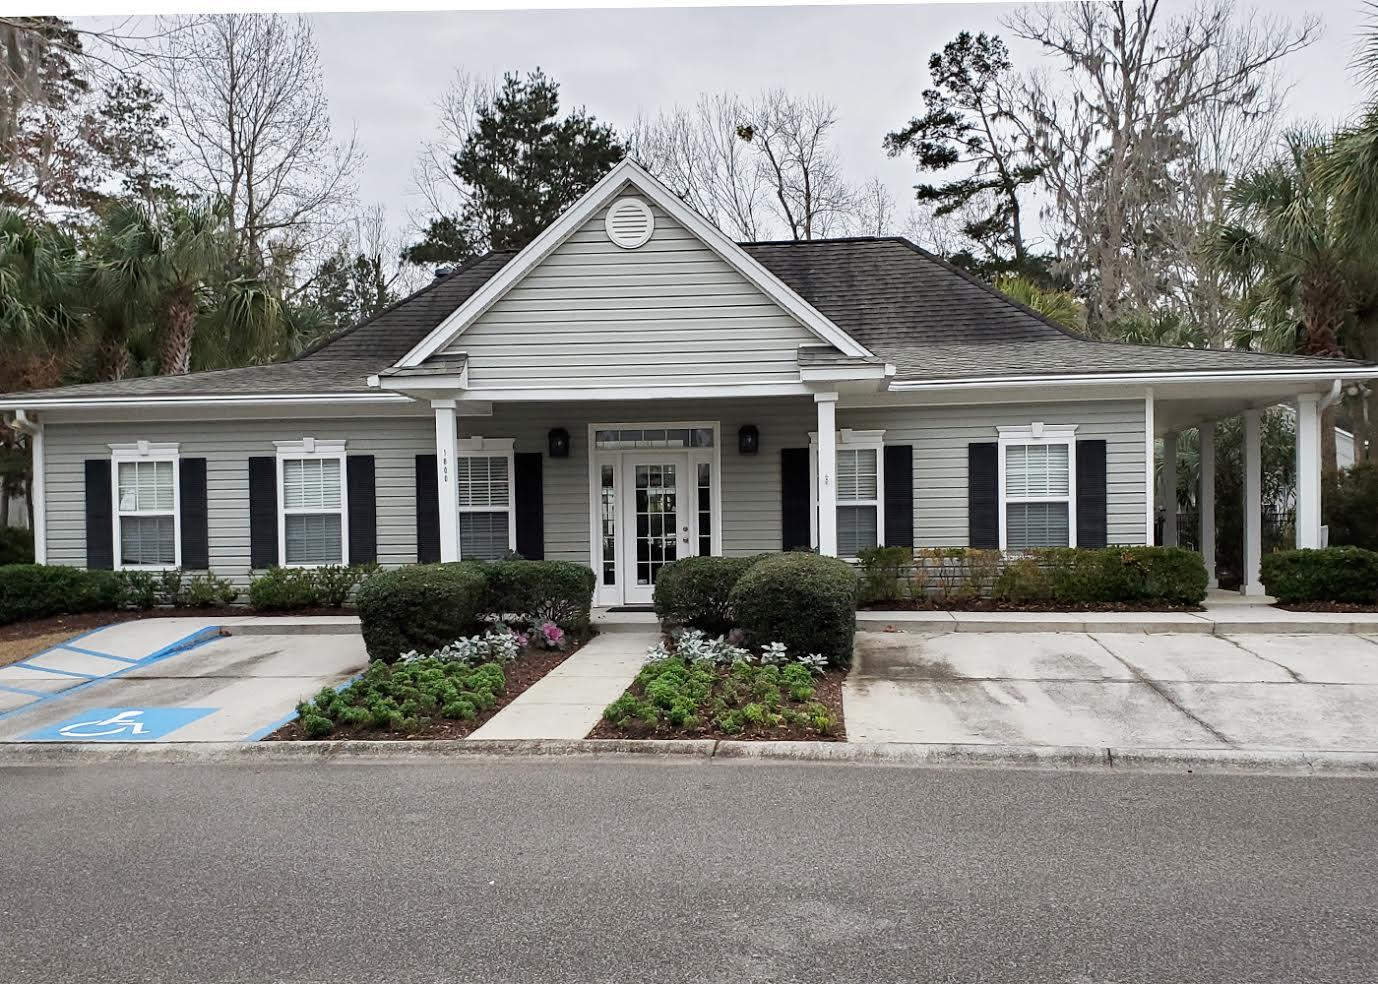 Grand Oaks Plantation Homes For Sale - 1607 Whitby, Charleston, SC - 1